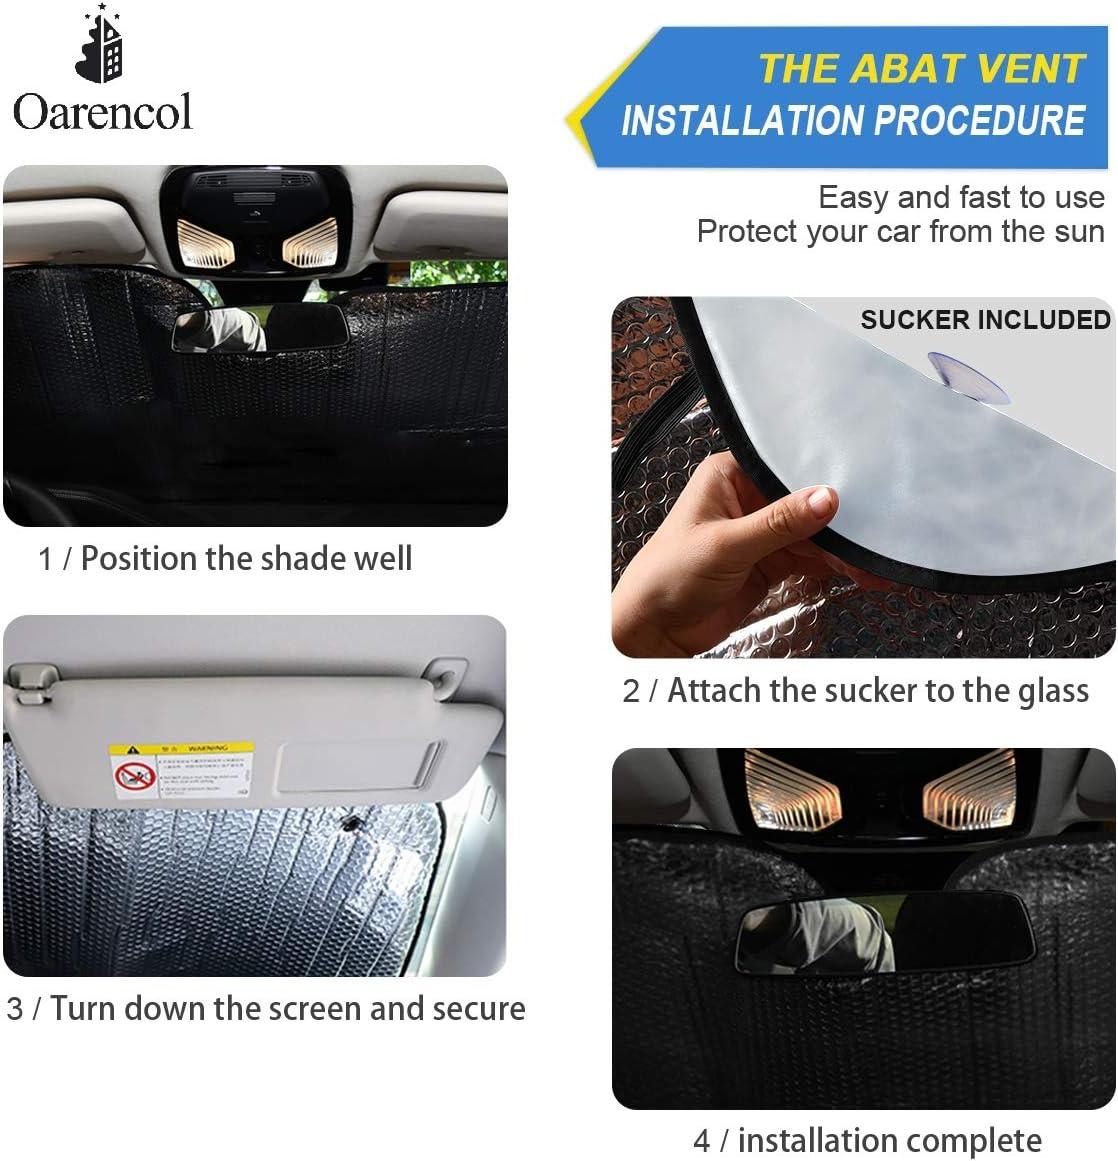 139,7 x 70,1 cm Parasol plegable para parabrisas de coche Oarencol Animal Wolf